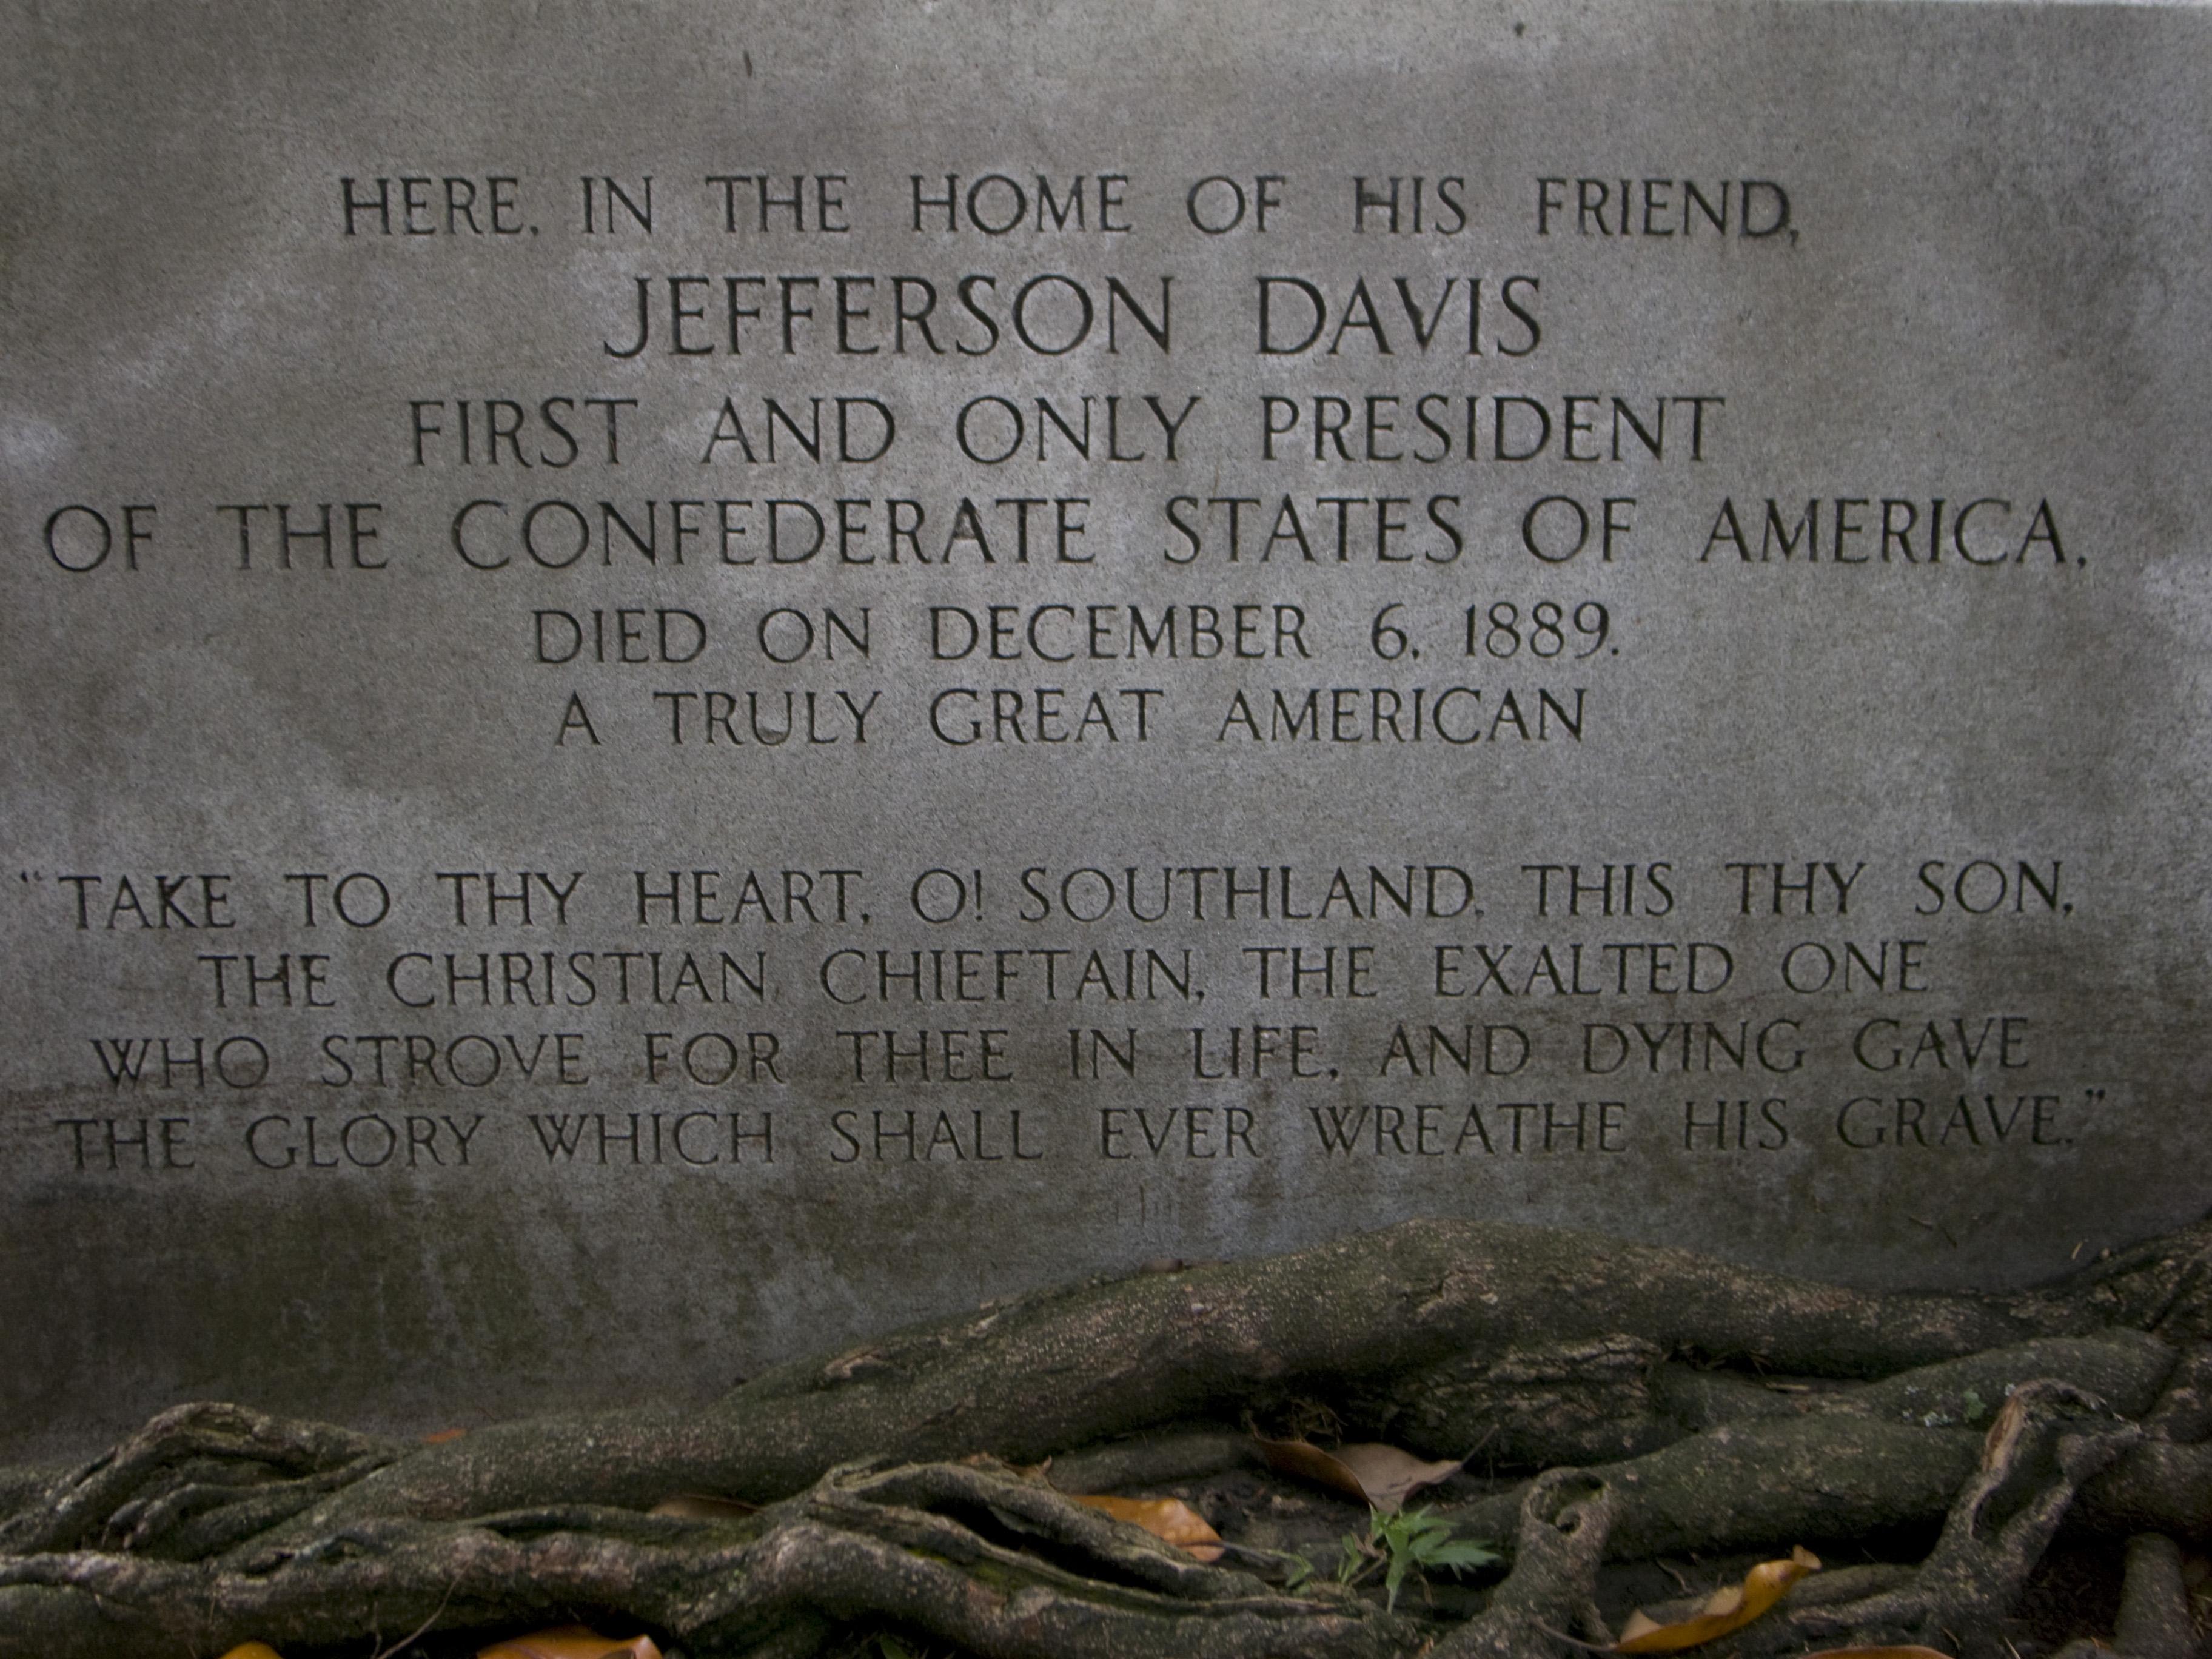 File:Jeff Davis Died O...